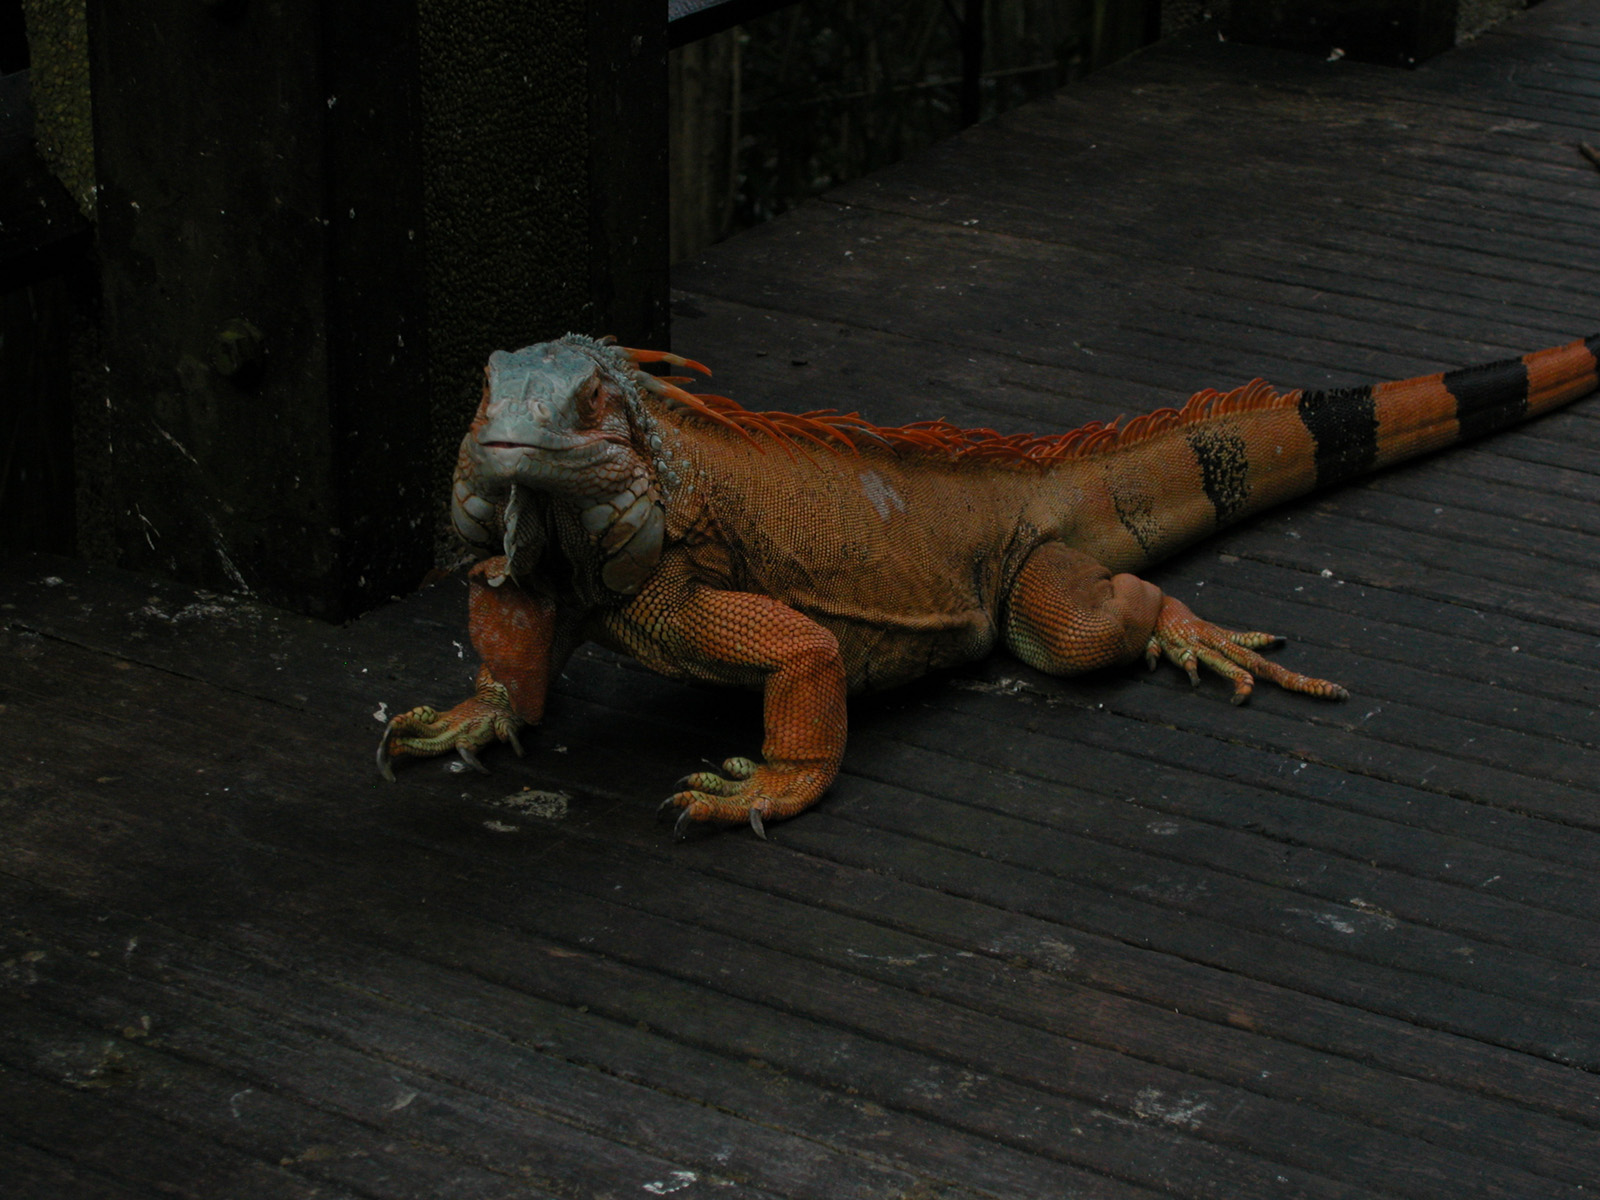 http://4.bp.blogspot.com/-T3UYy35DSPI/T-bpivbz46I/AAAAAAAACvA/imzBgAniA-A/s1600/iguana+images.jpeg